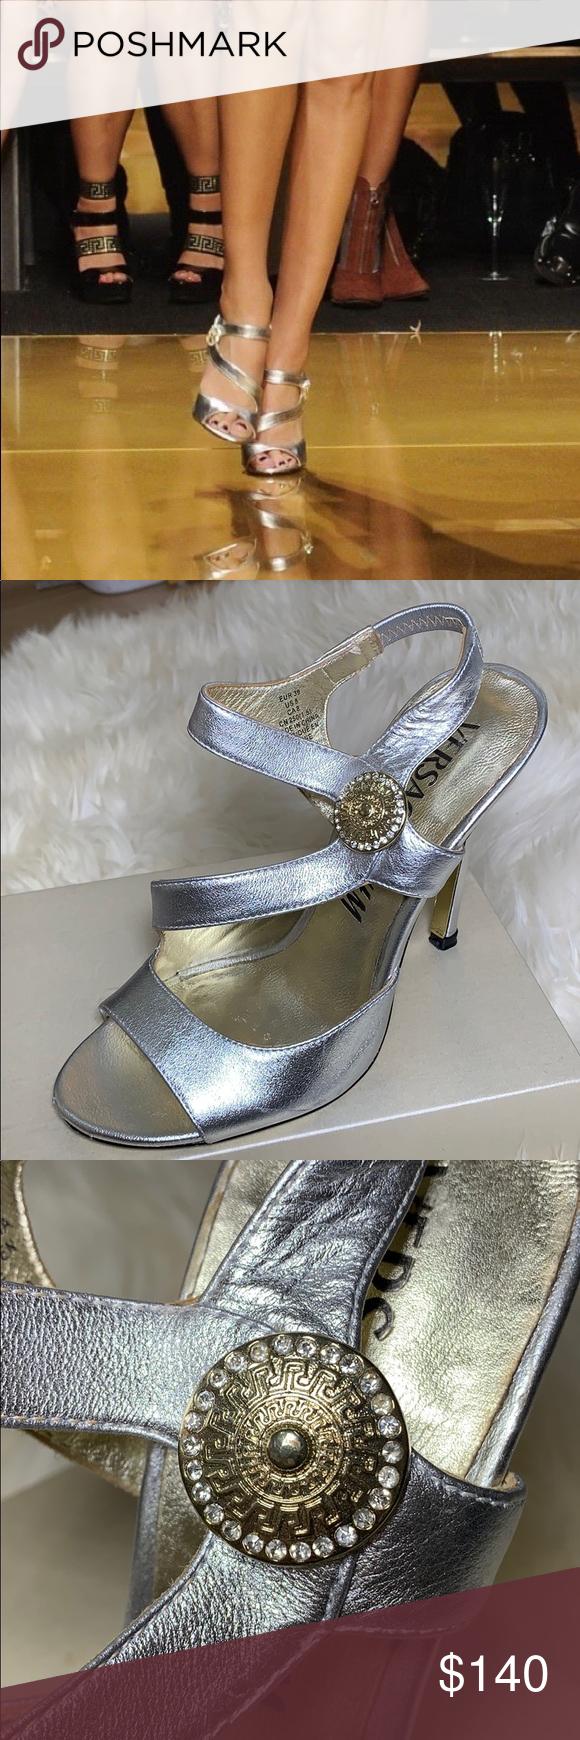 Versace x H\u0026M stilettos   H\u0026m shoes